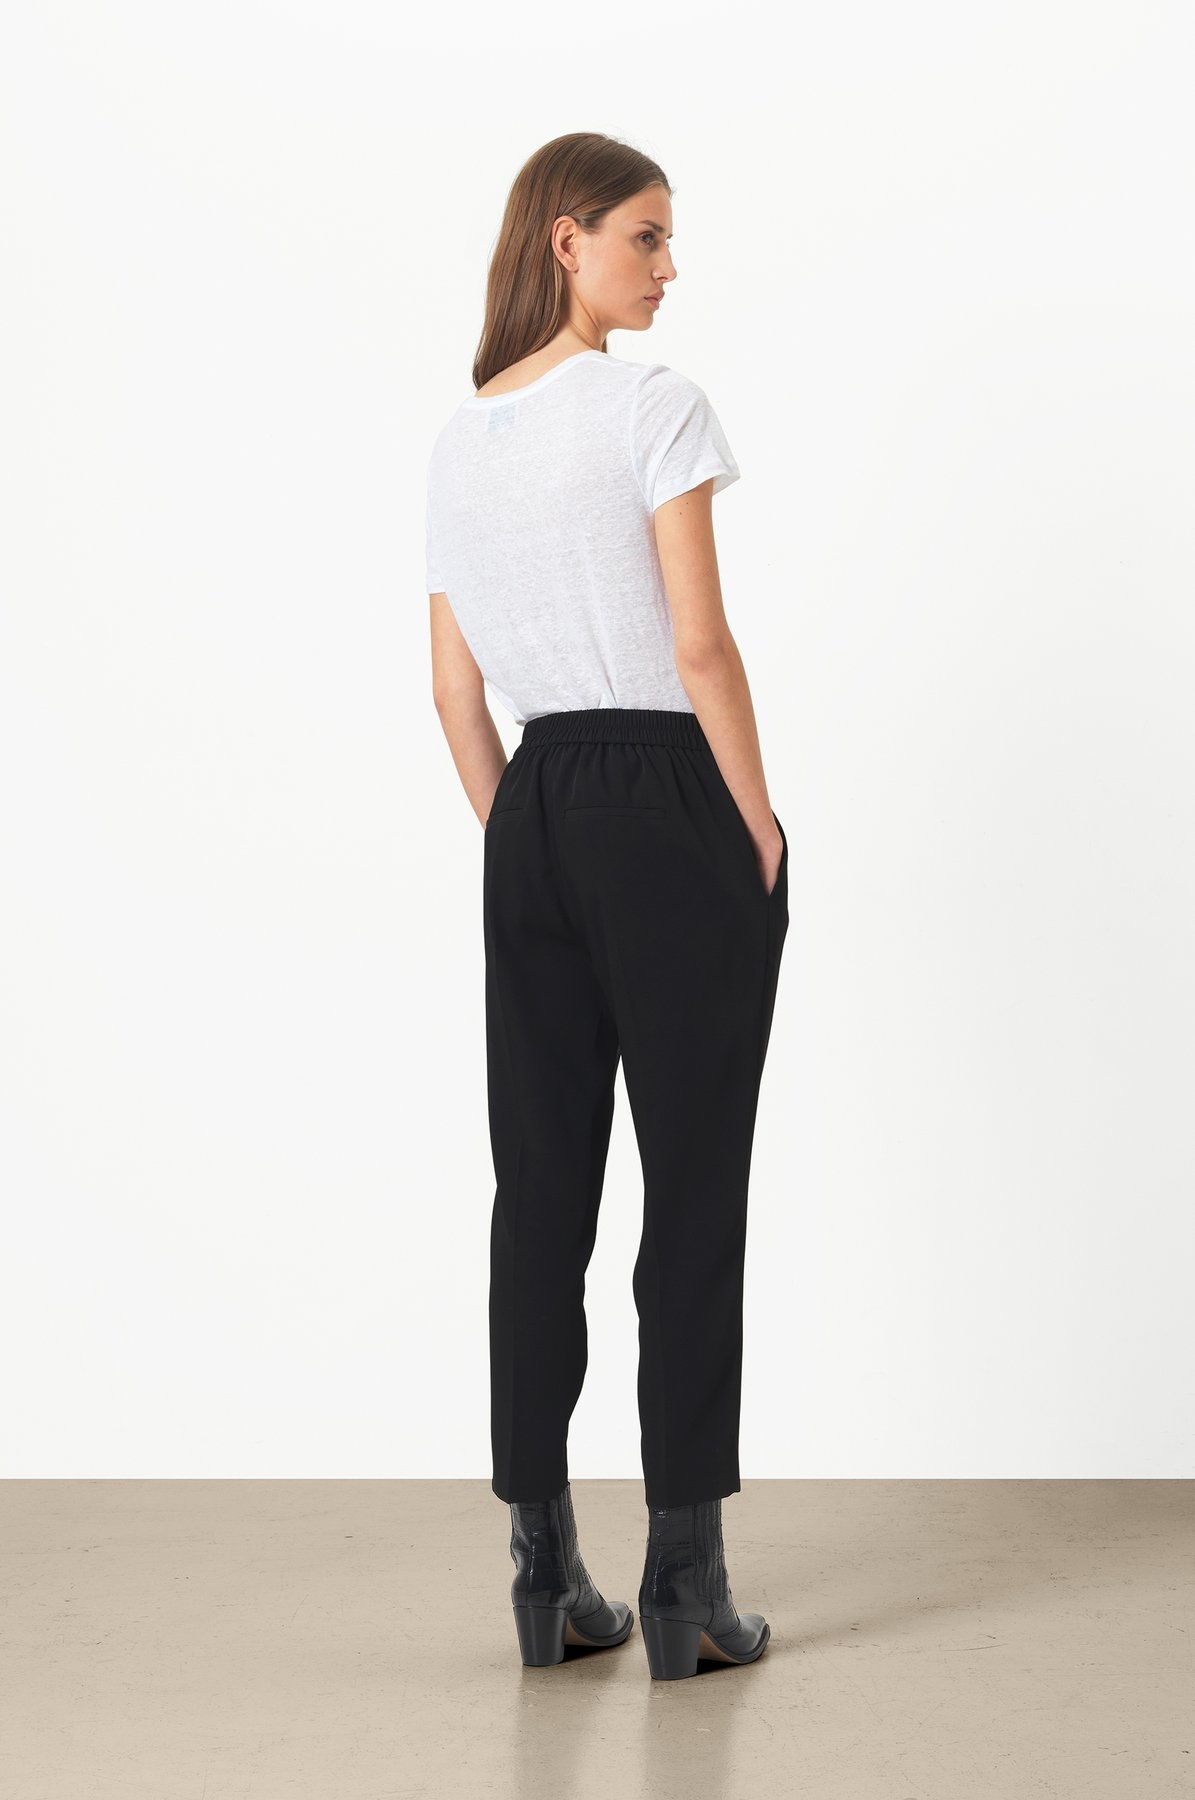 Garbo Trousers - Peppercorn-5